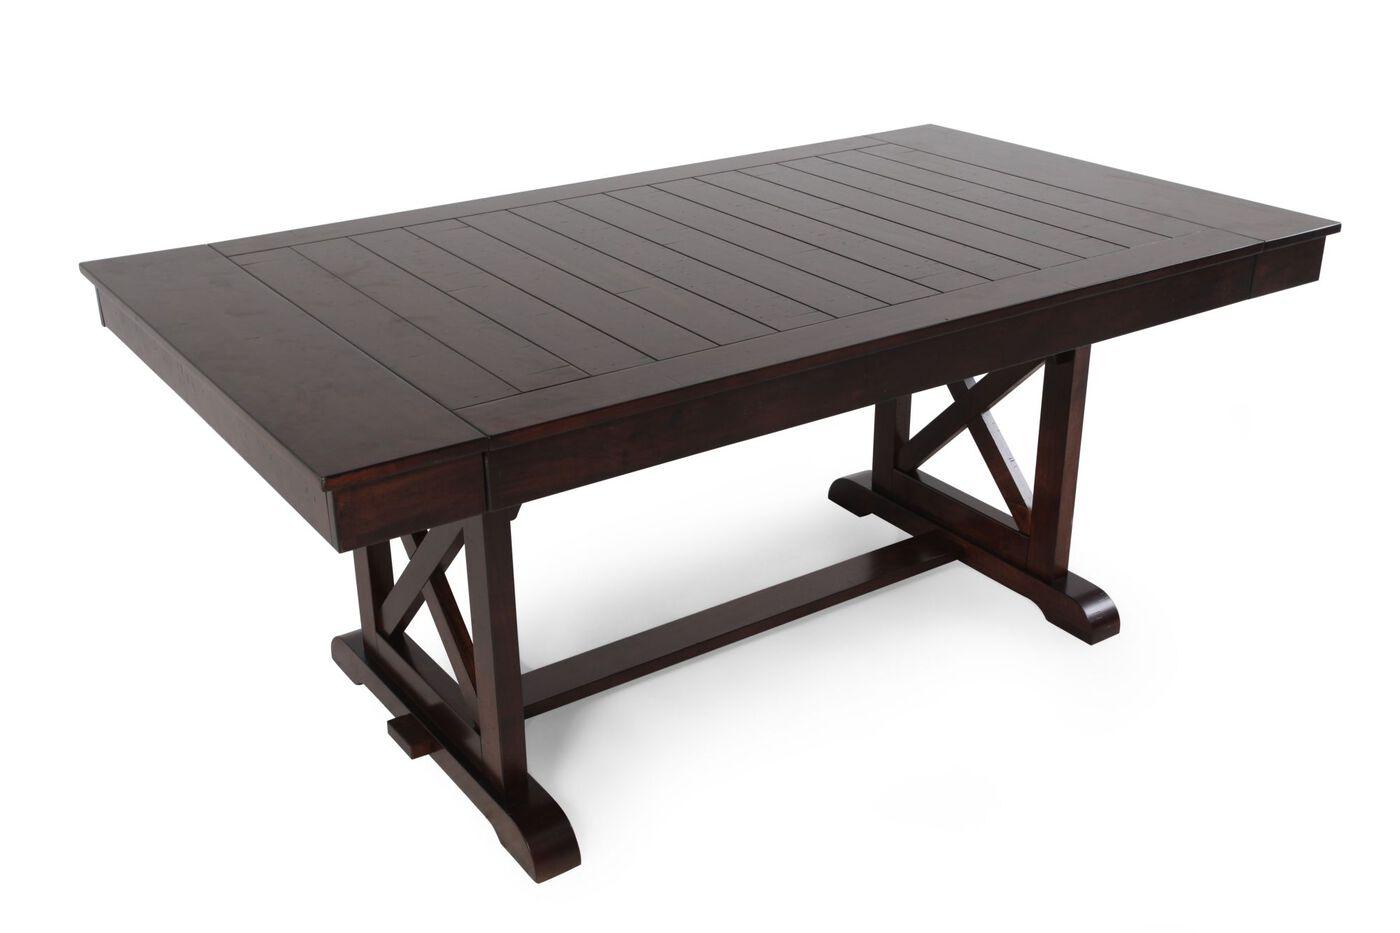 expandable patio table canada 28 images splendiferous  : WIN DJ14094 3 from bighomes.ca size 1400 x 933 jpeg 63kB